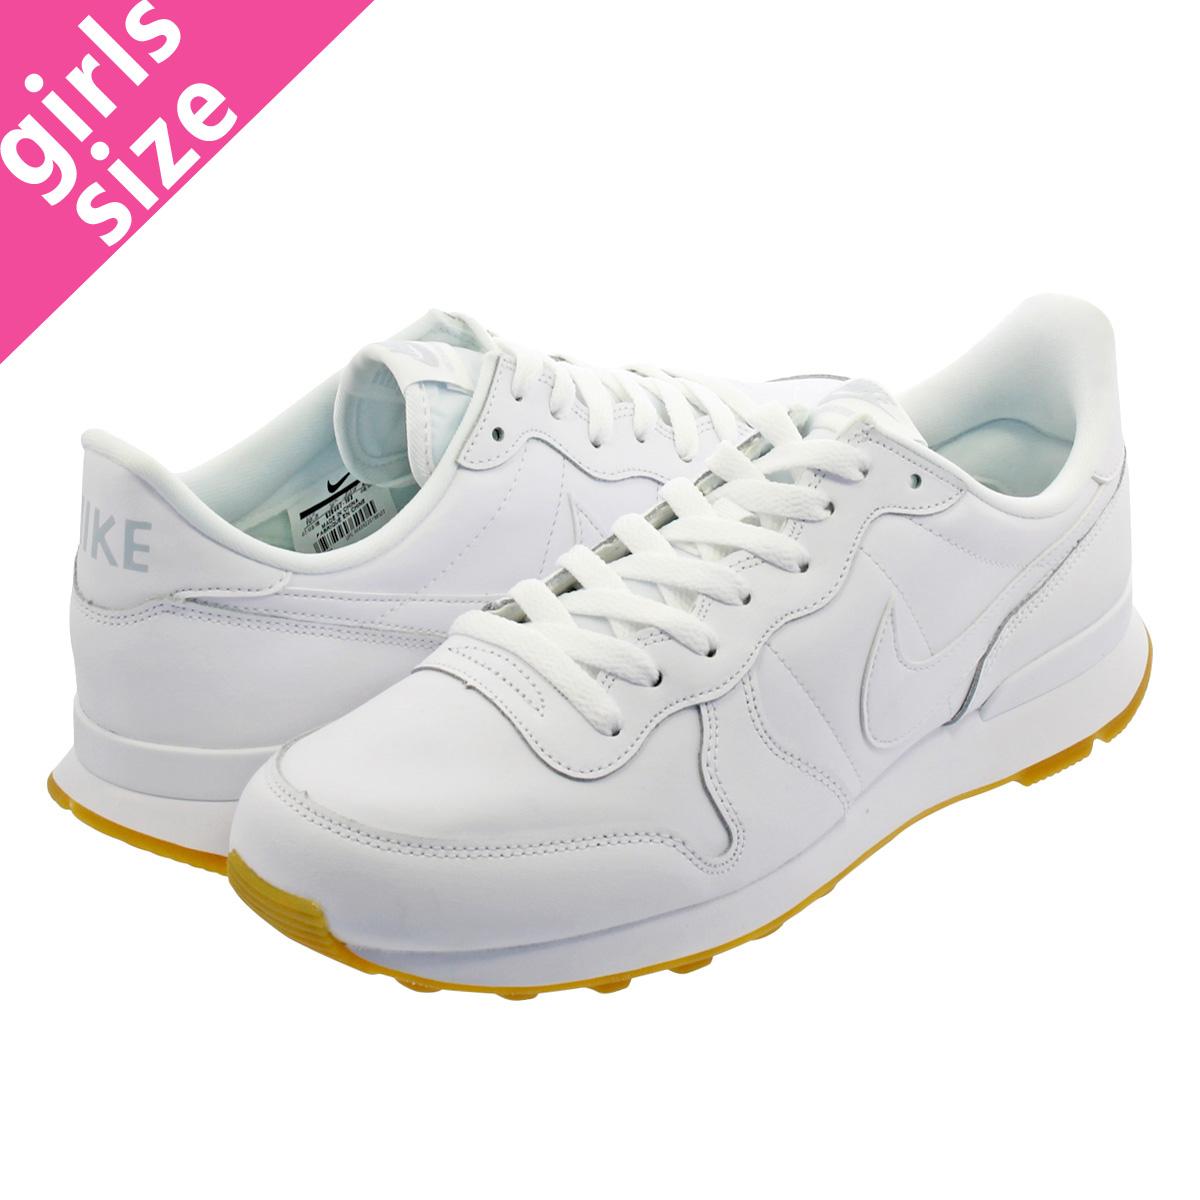 the best attitude b9080 33372 NIKE WMNS INTERNATIONALIST Nike women internationalist WHITE WHITE GUM  LIGHT BROWN WHITE 828,407-103